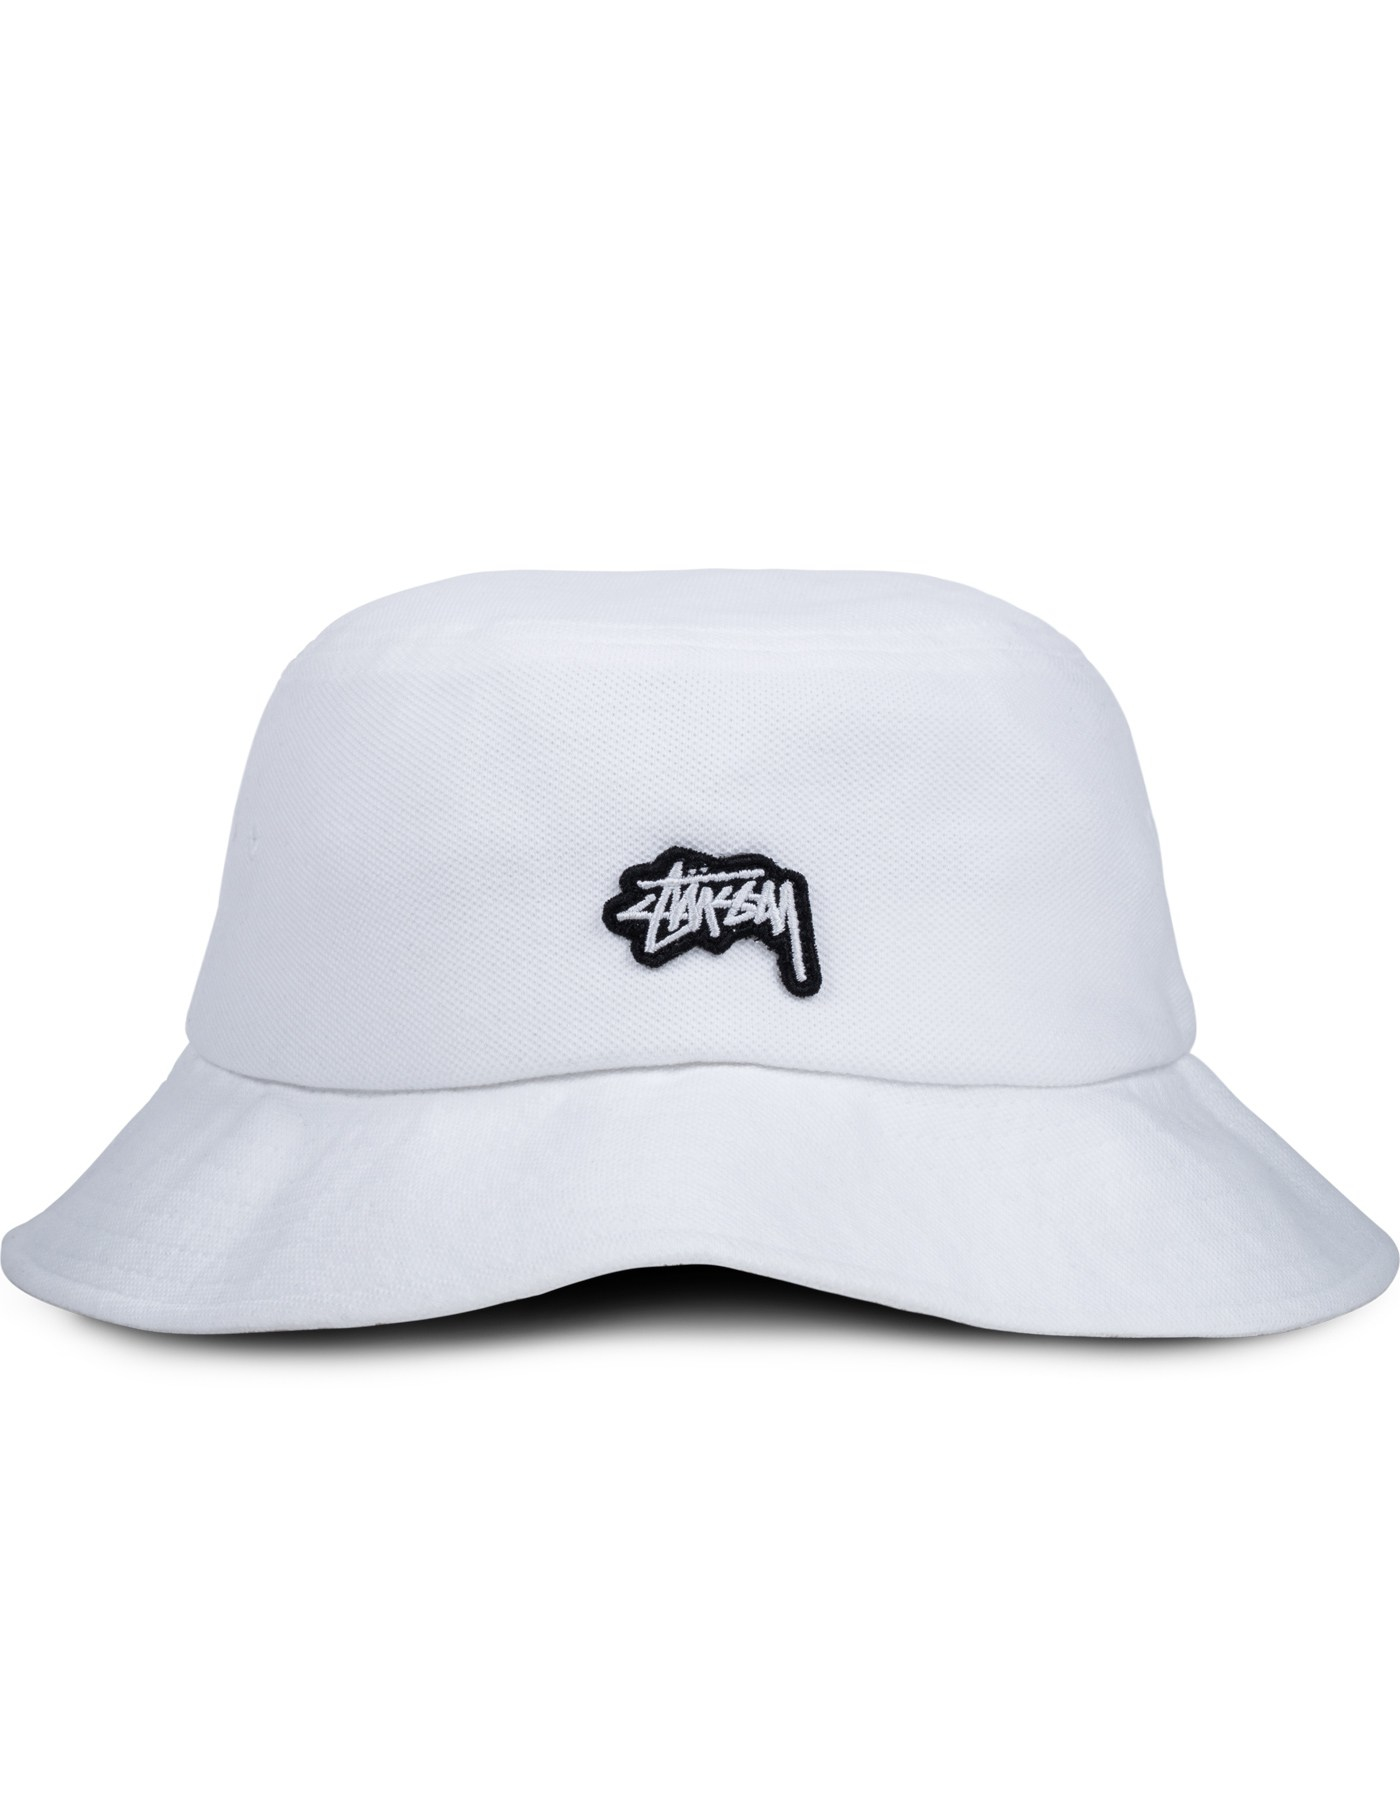 Stussy Stock Logo Pique Bucket Hat in White | Lyst